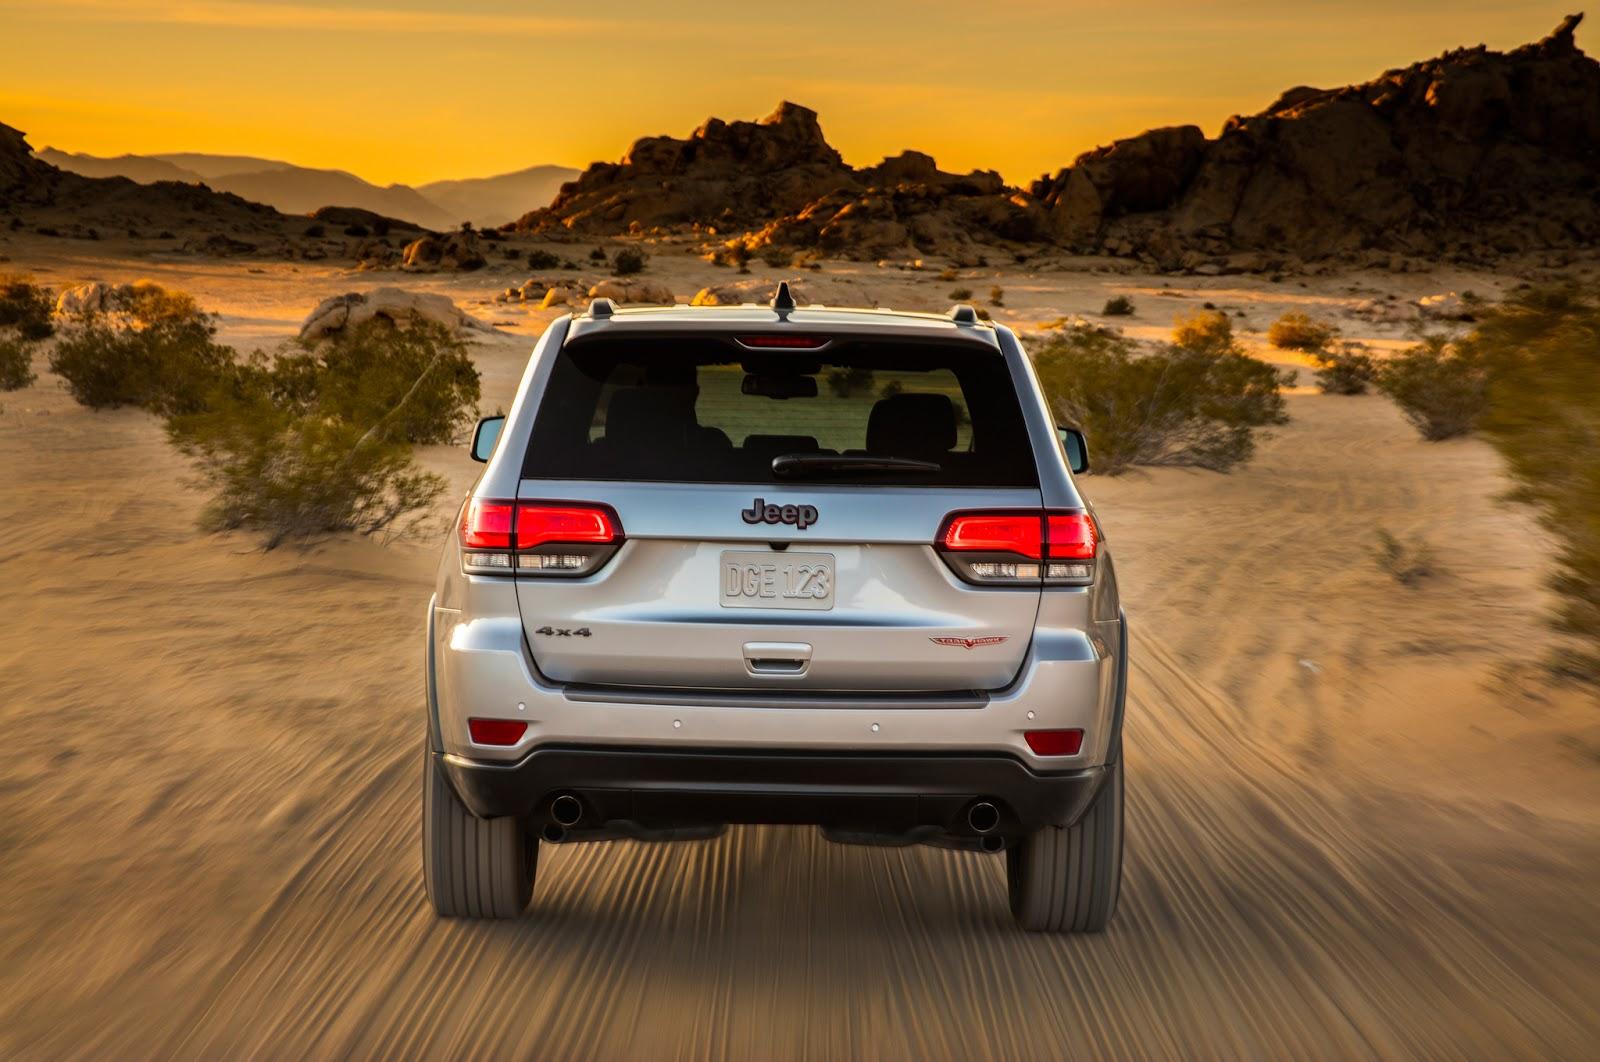 2017 Jeep Grand Cherokee Trailhawk rear end in motion Το επόμενο Grand Cherokee θα βασίζεται στη Giulia!